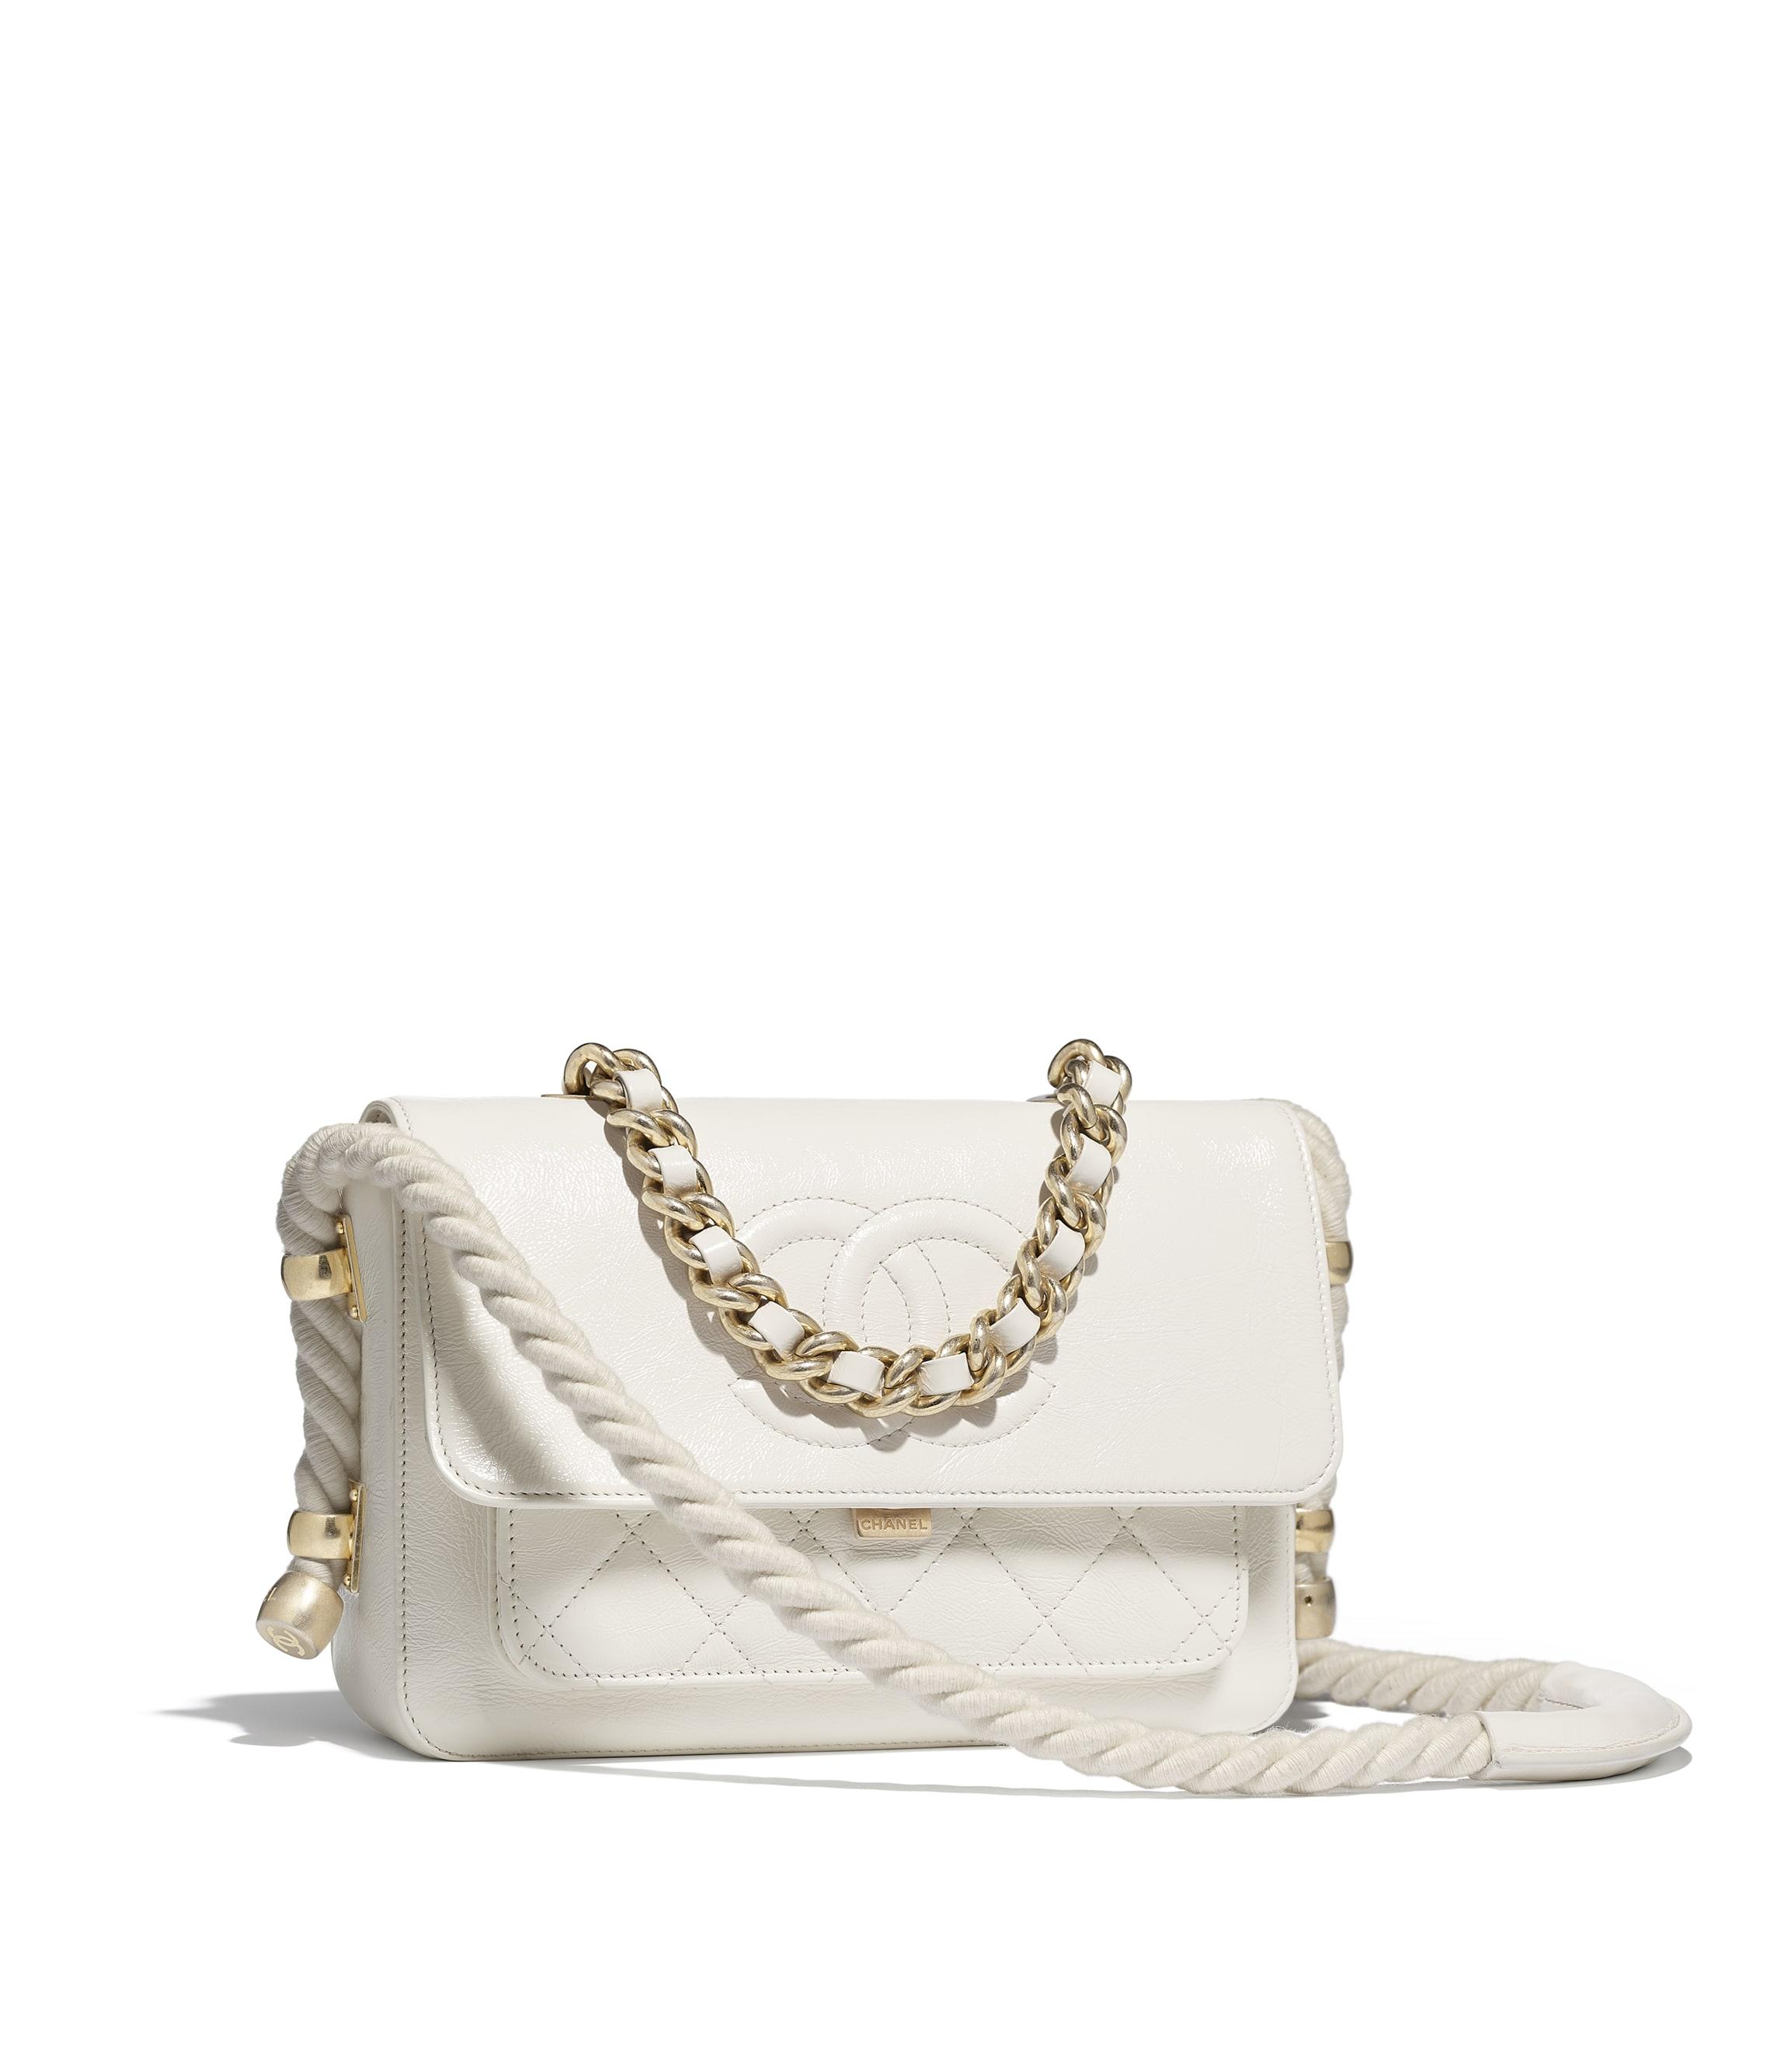 2c4e38946e788a Flap Bag, crumpled calfskin, cotton & gold-tone metal, white - CHANEL